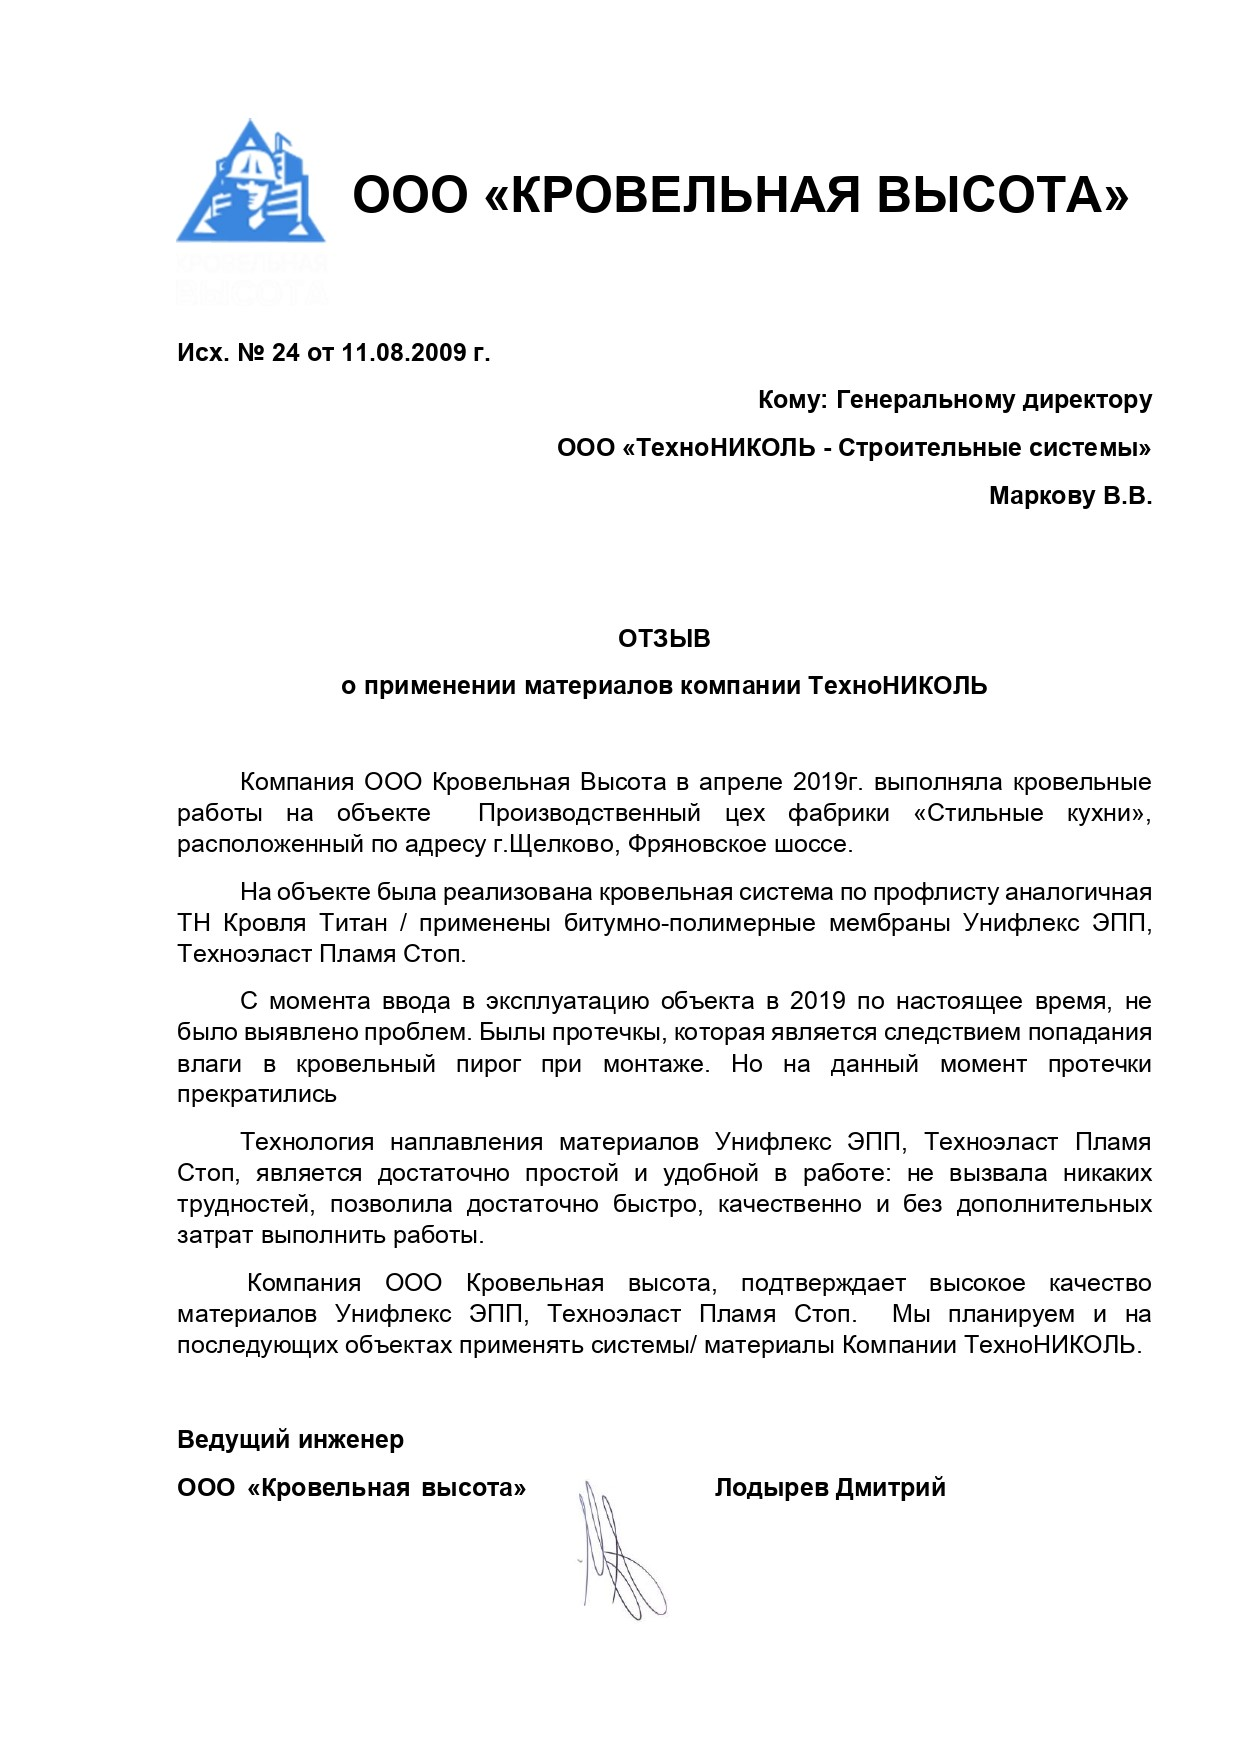 https://shop.tn.ru/media/other_documents/_2019_.__000078.jpg